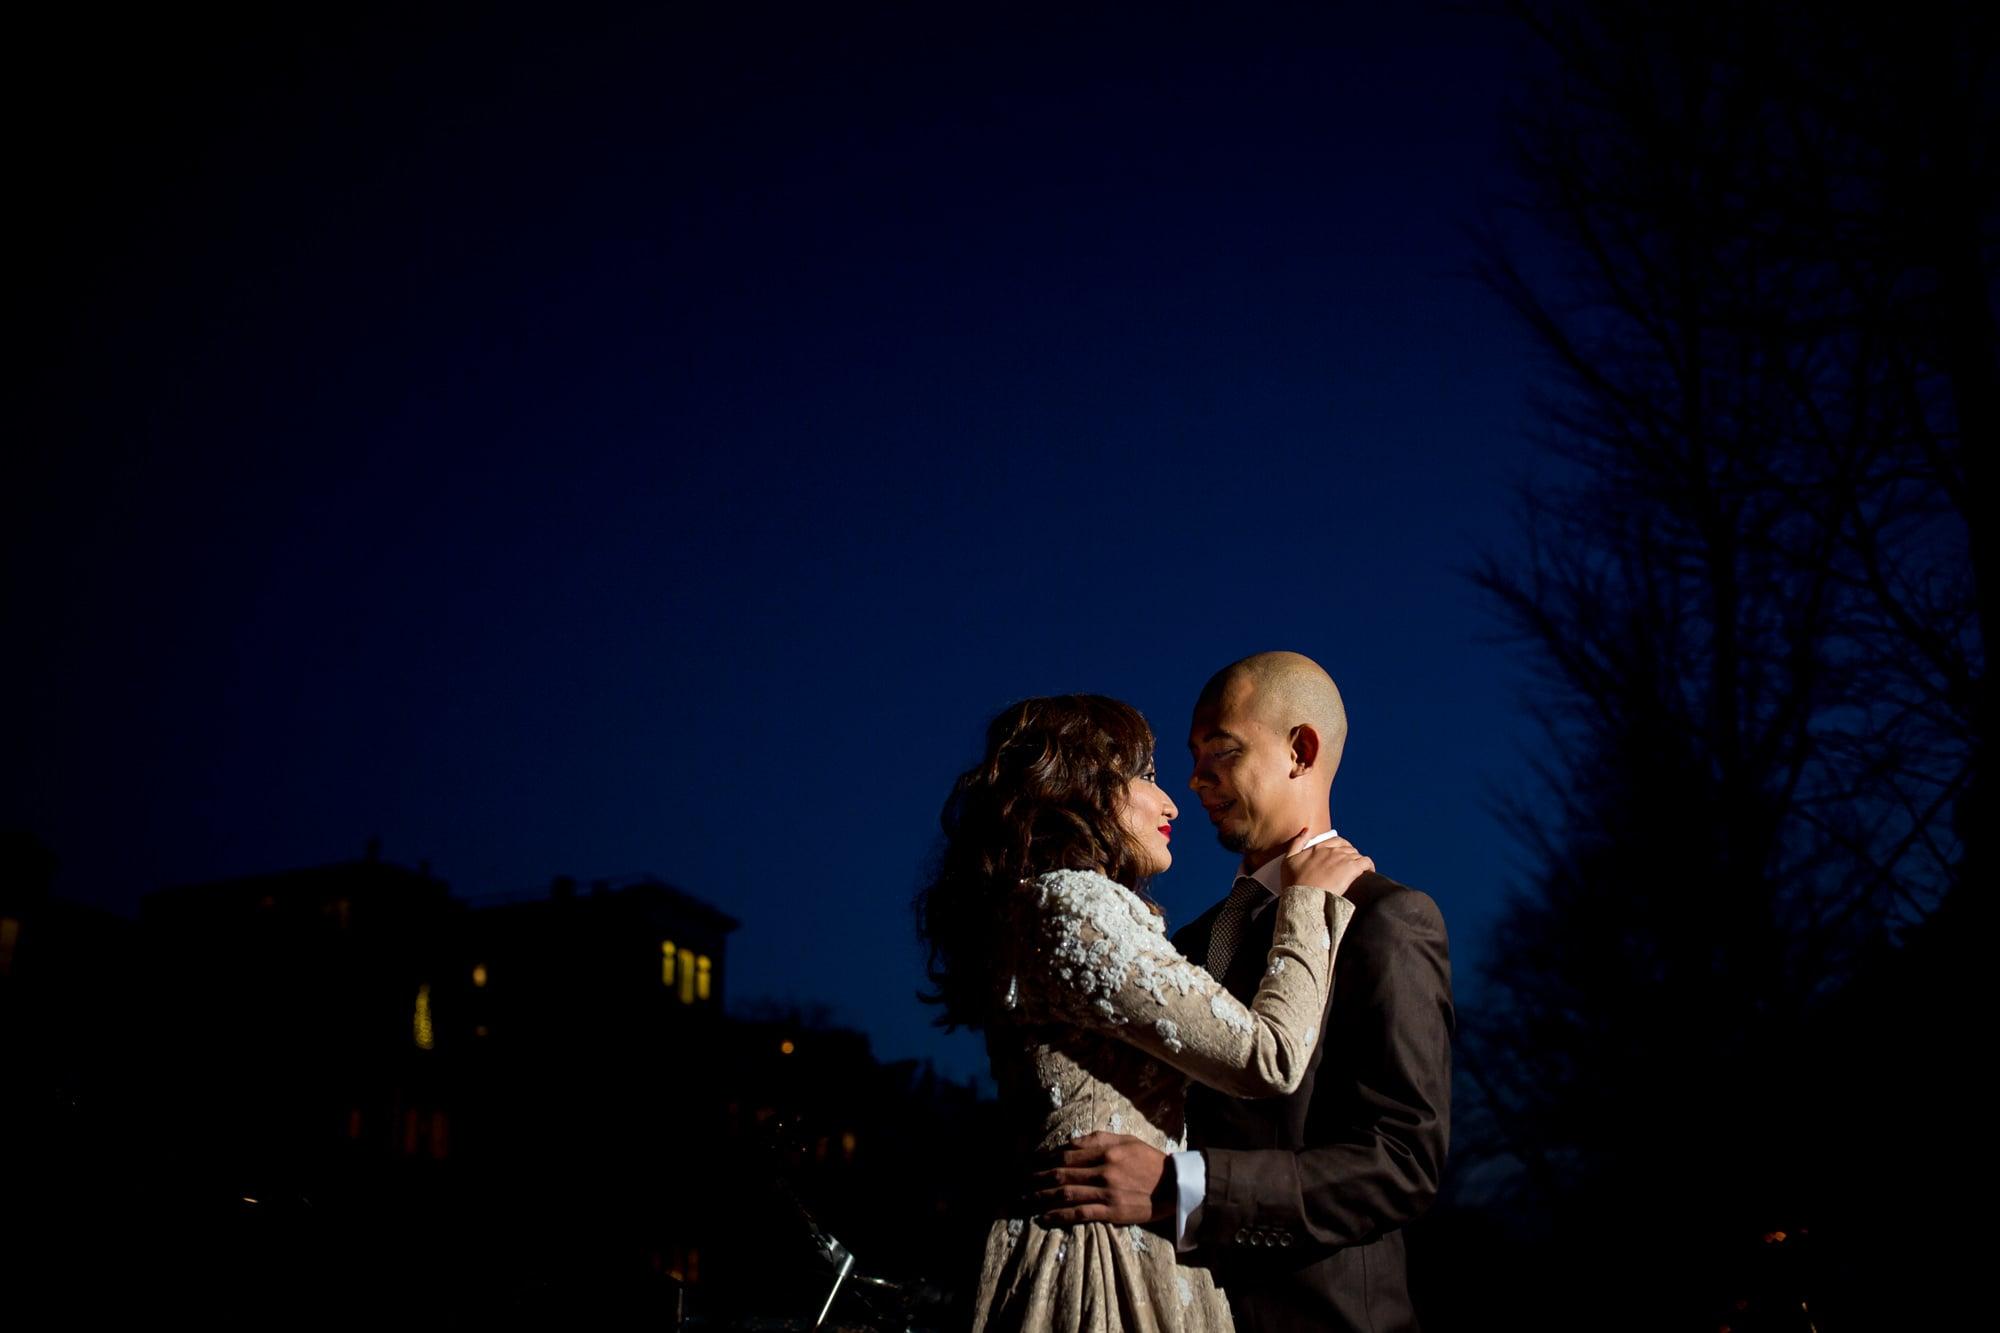 After Wedding Photoshoot Amsterdam - 01.jpg